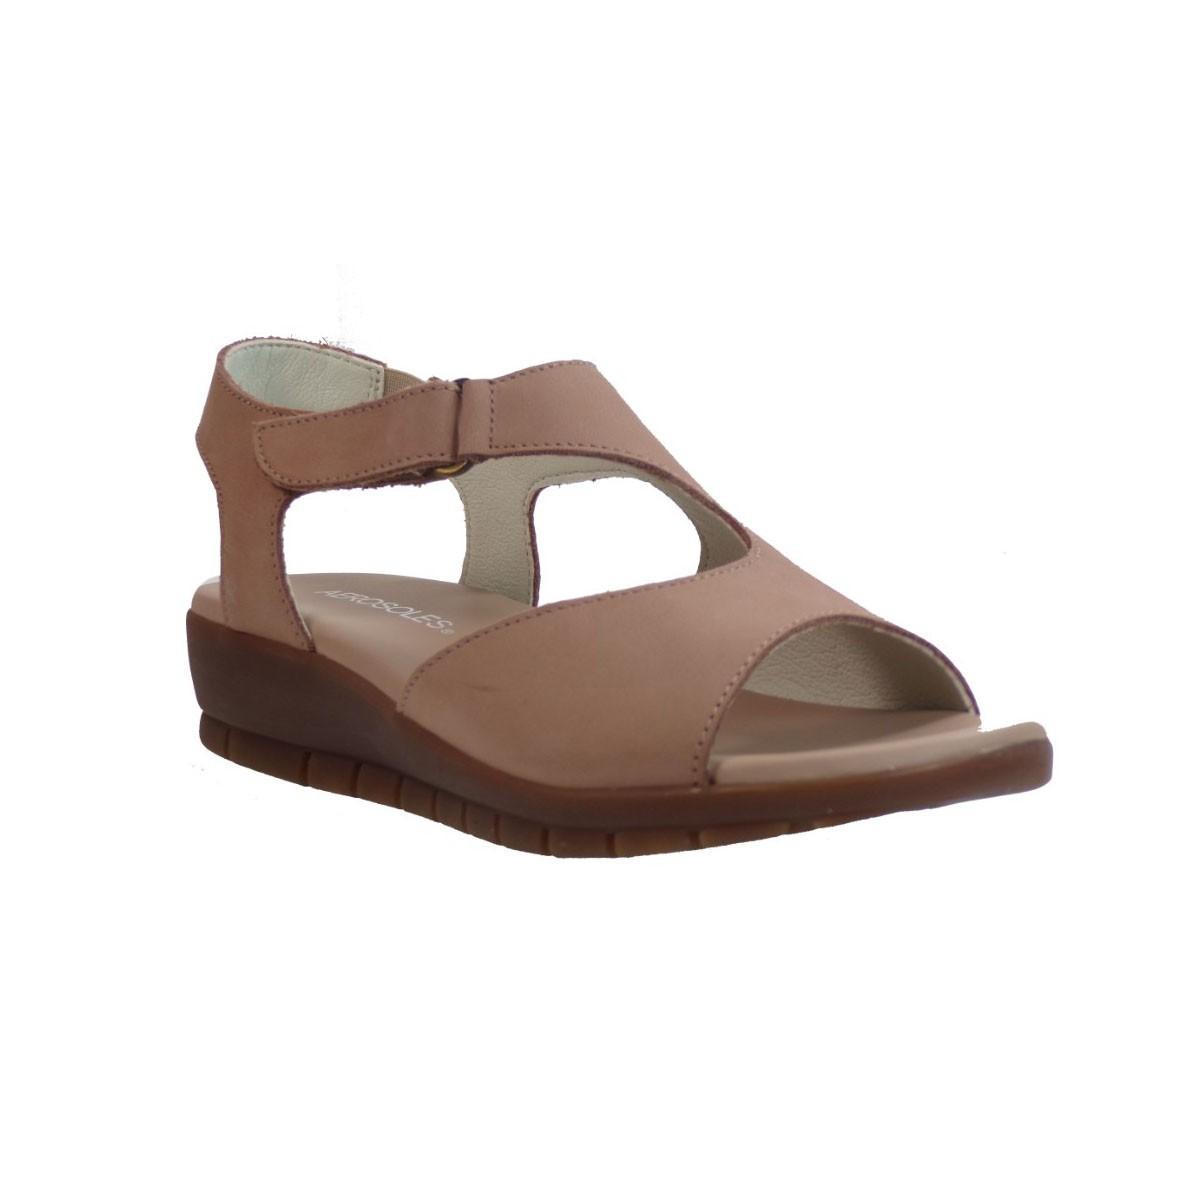 Aerosoles Γυναικεία Παπούτσια Πέδιλα HANDY Μπεζ Aerosoles HANDY Μπεζ